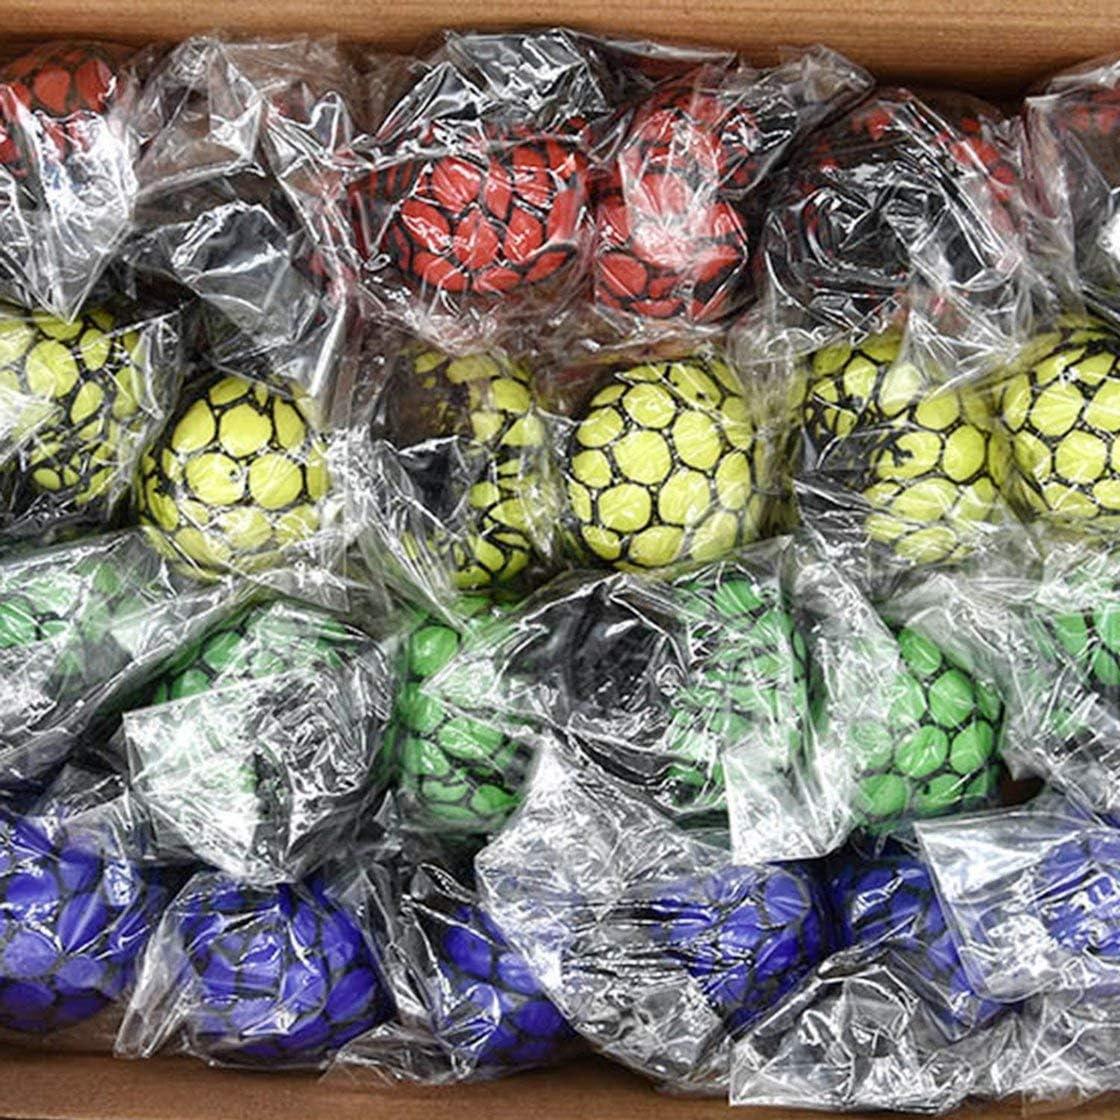 Jessicadaphne Soulagement du Stress Mignon Balle Novetly Squeeze Ball Main Poignet Exercice Antistress Slime Ball Jouet Dr/ôle Gadgets Jouets